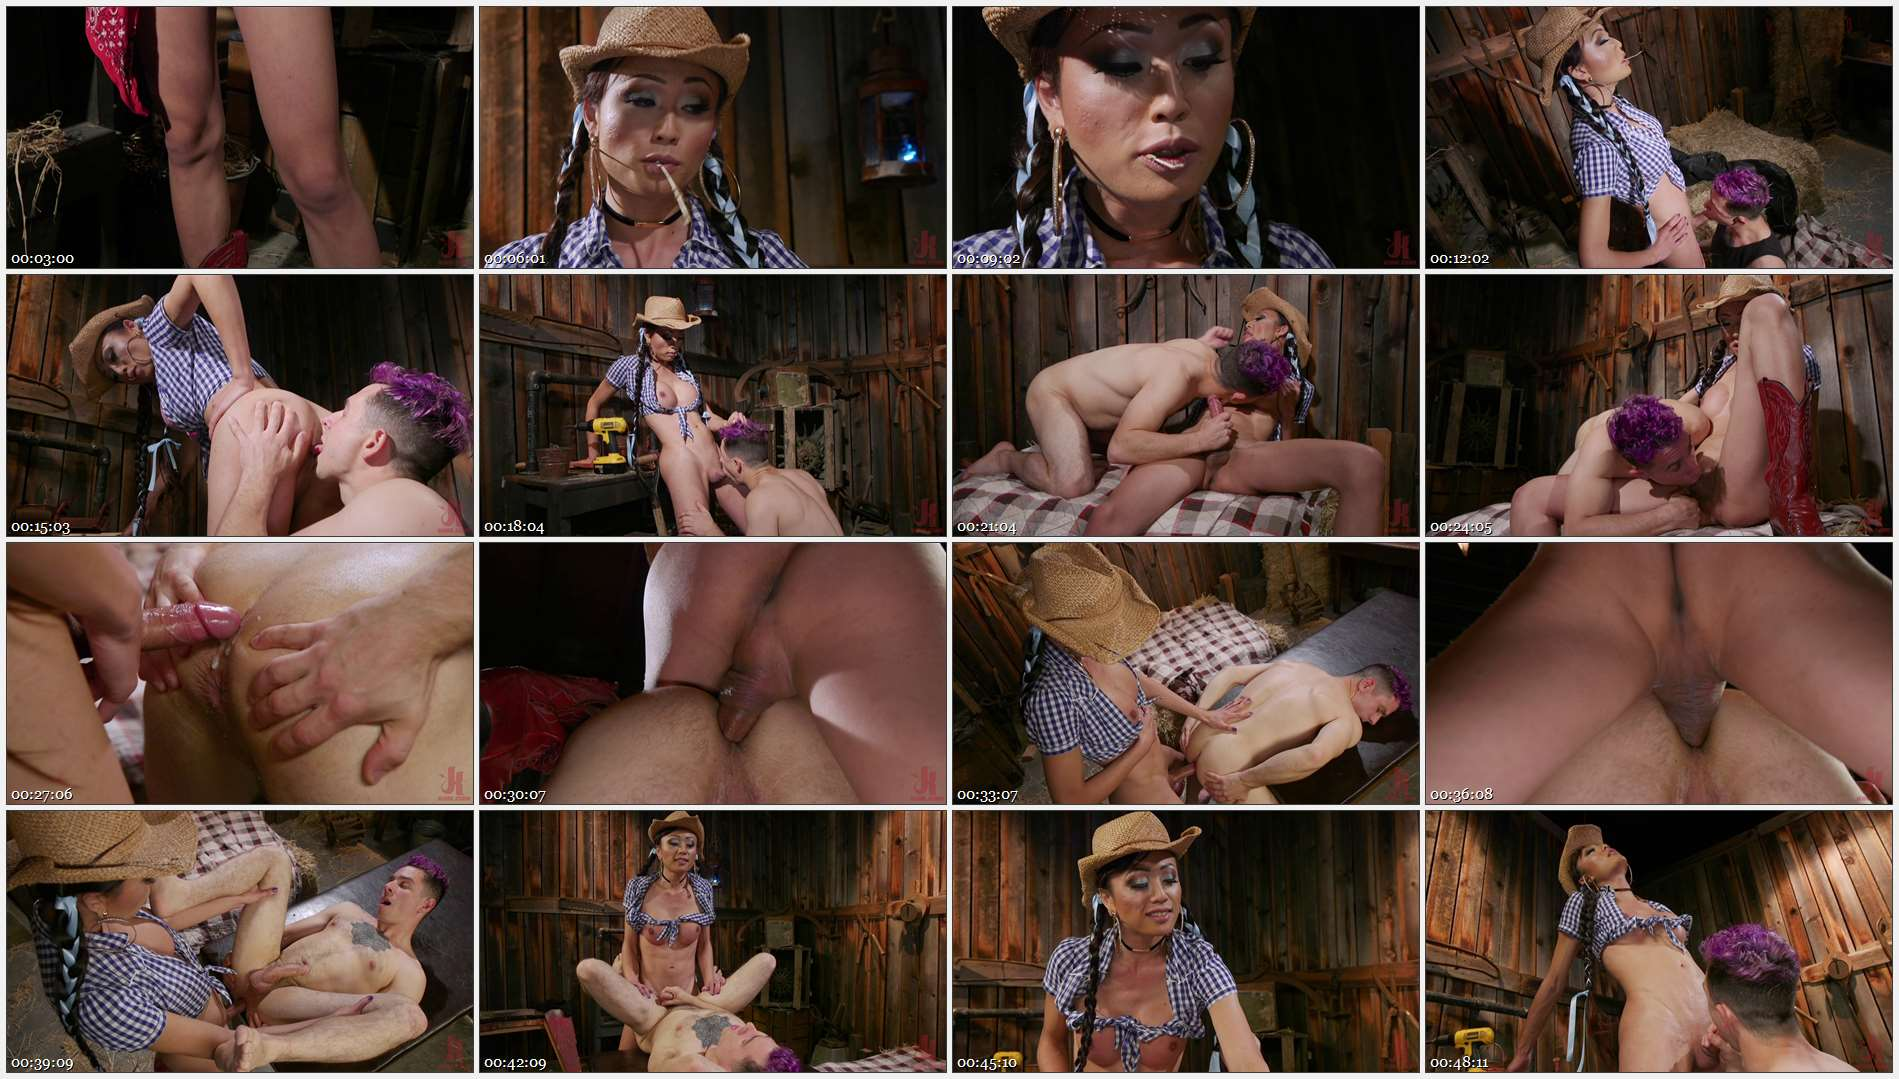 Venus Lux – Corbin Dallas – Earn Your Keep: Venus Lux\'s Country Barn Seduction